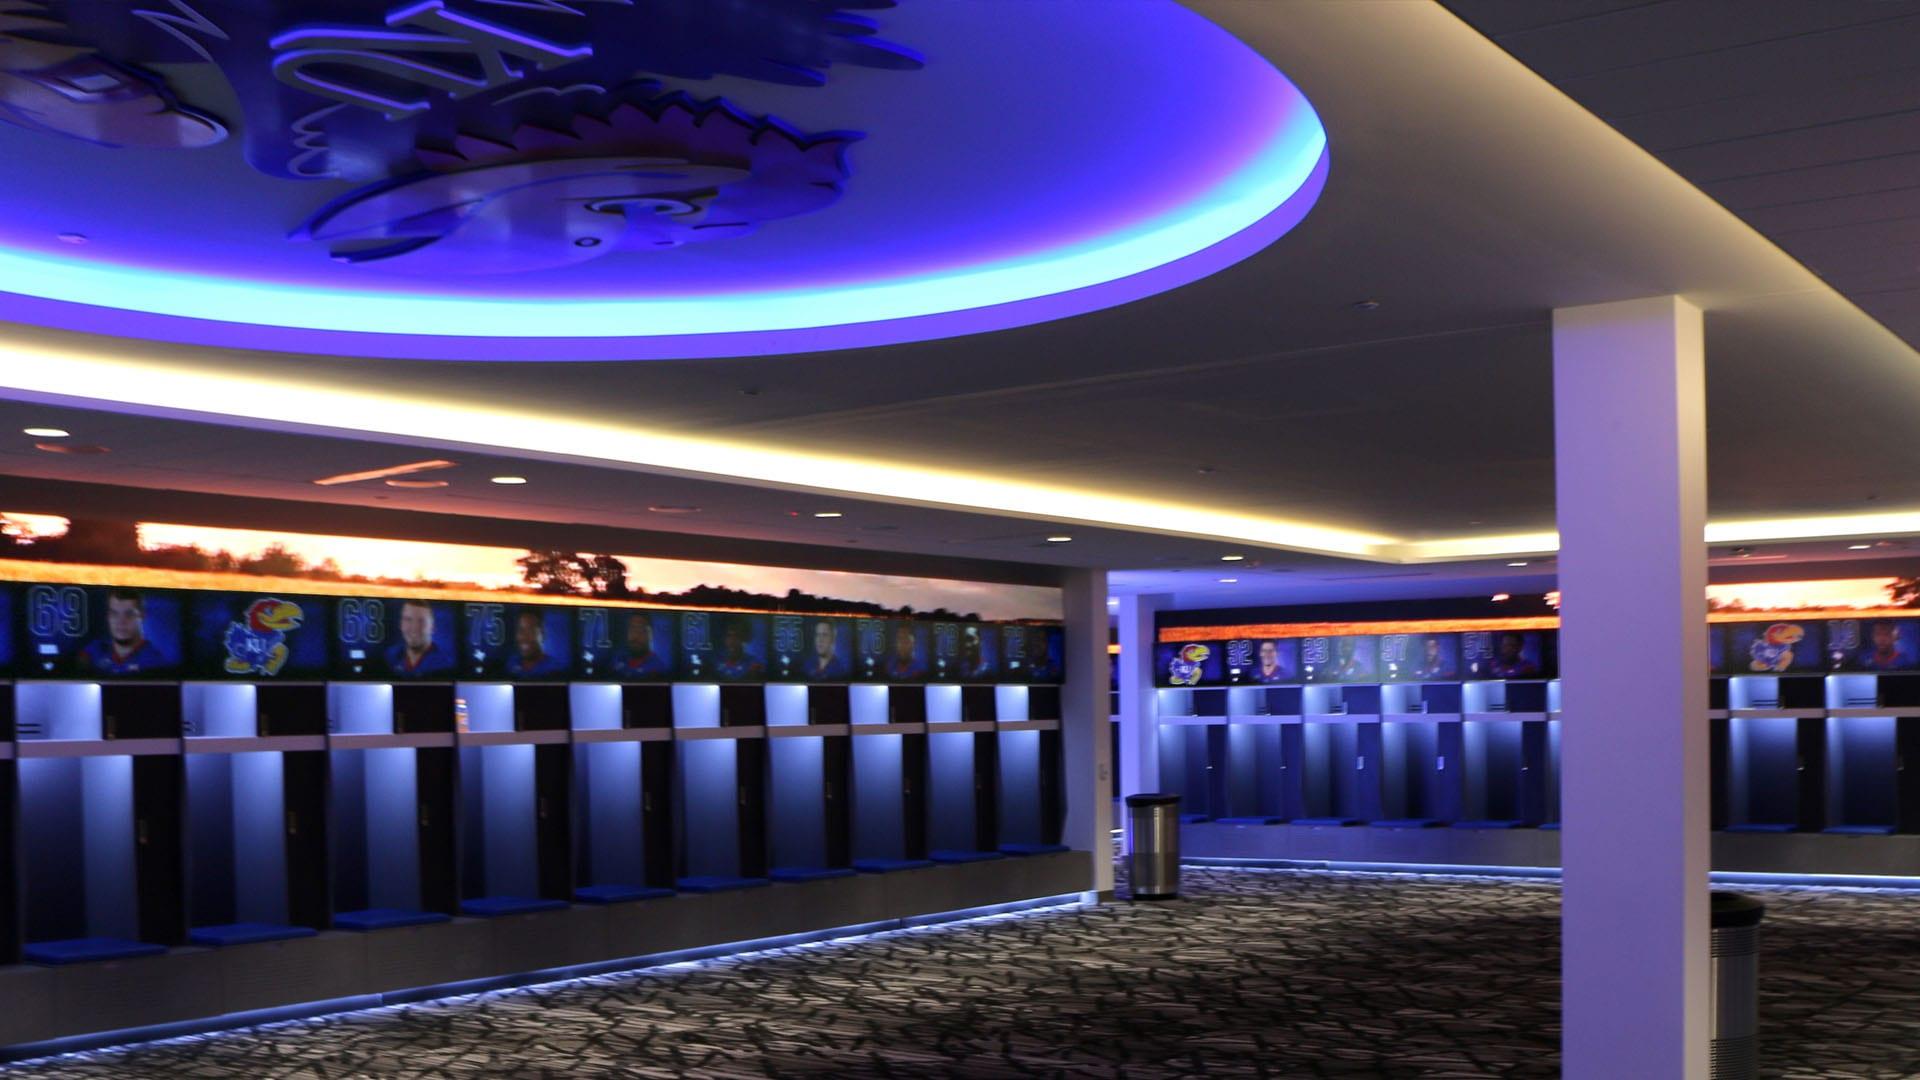 Neoti R Series Kansas University footbal locker room